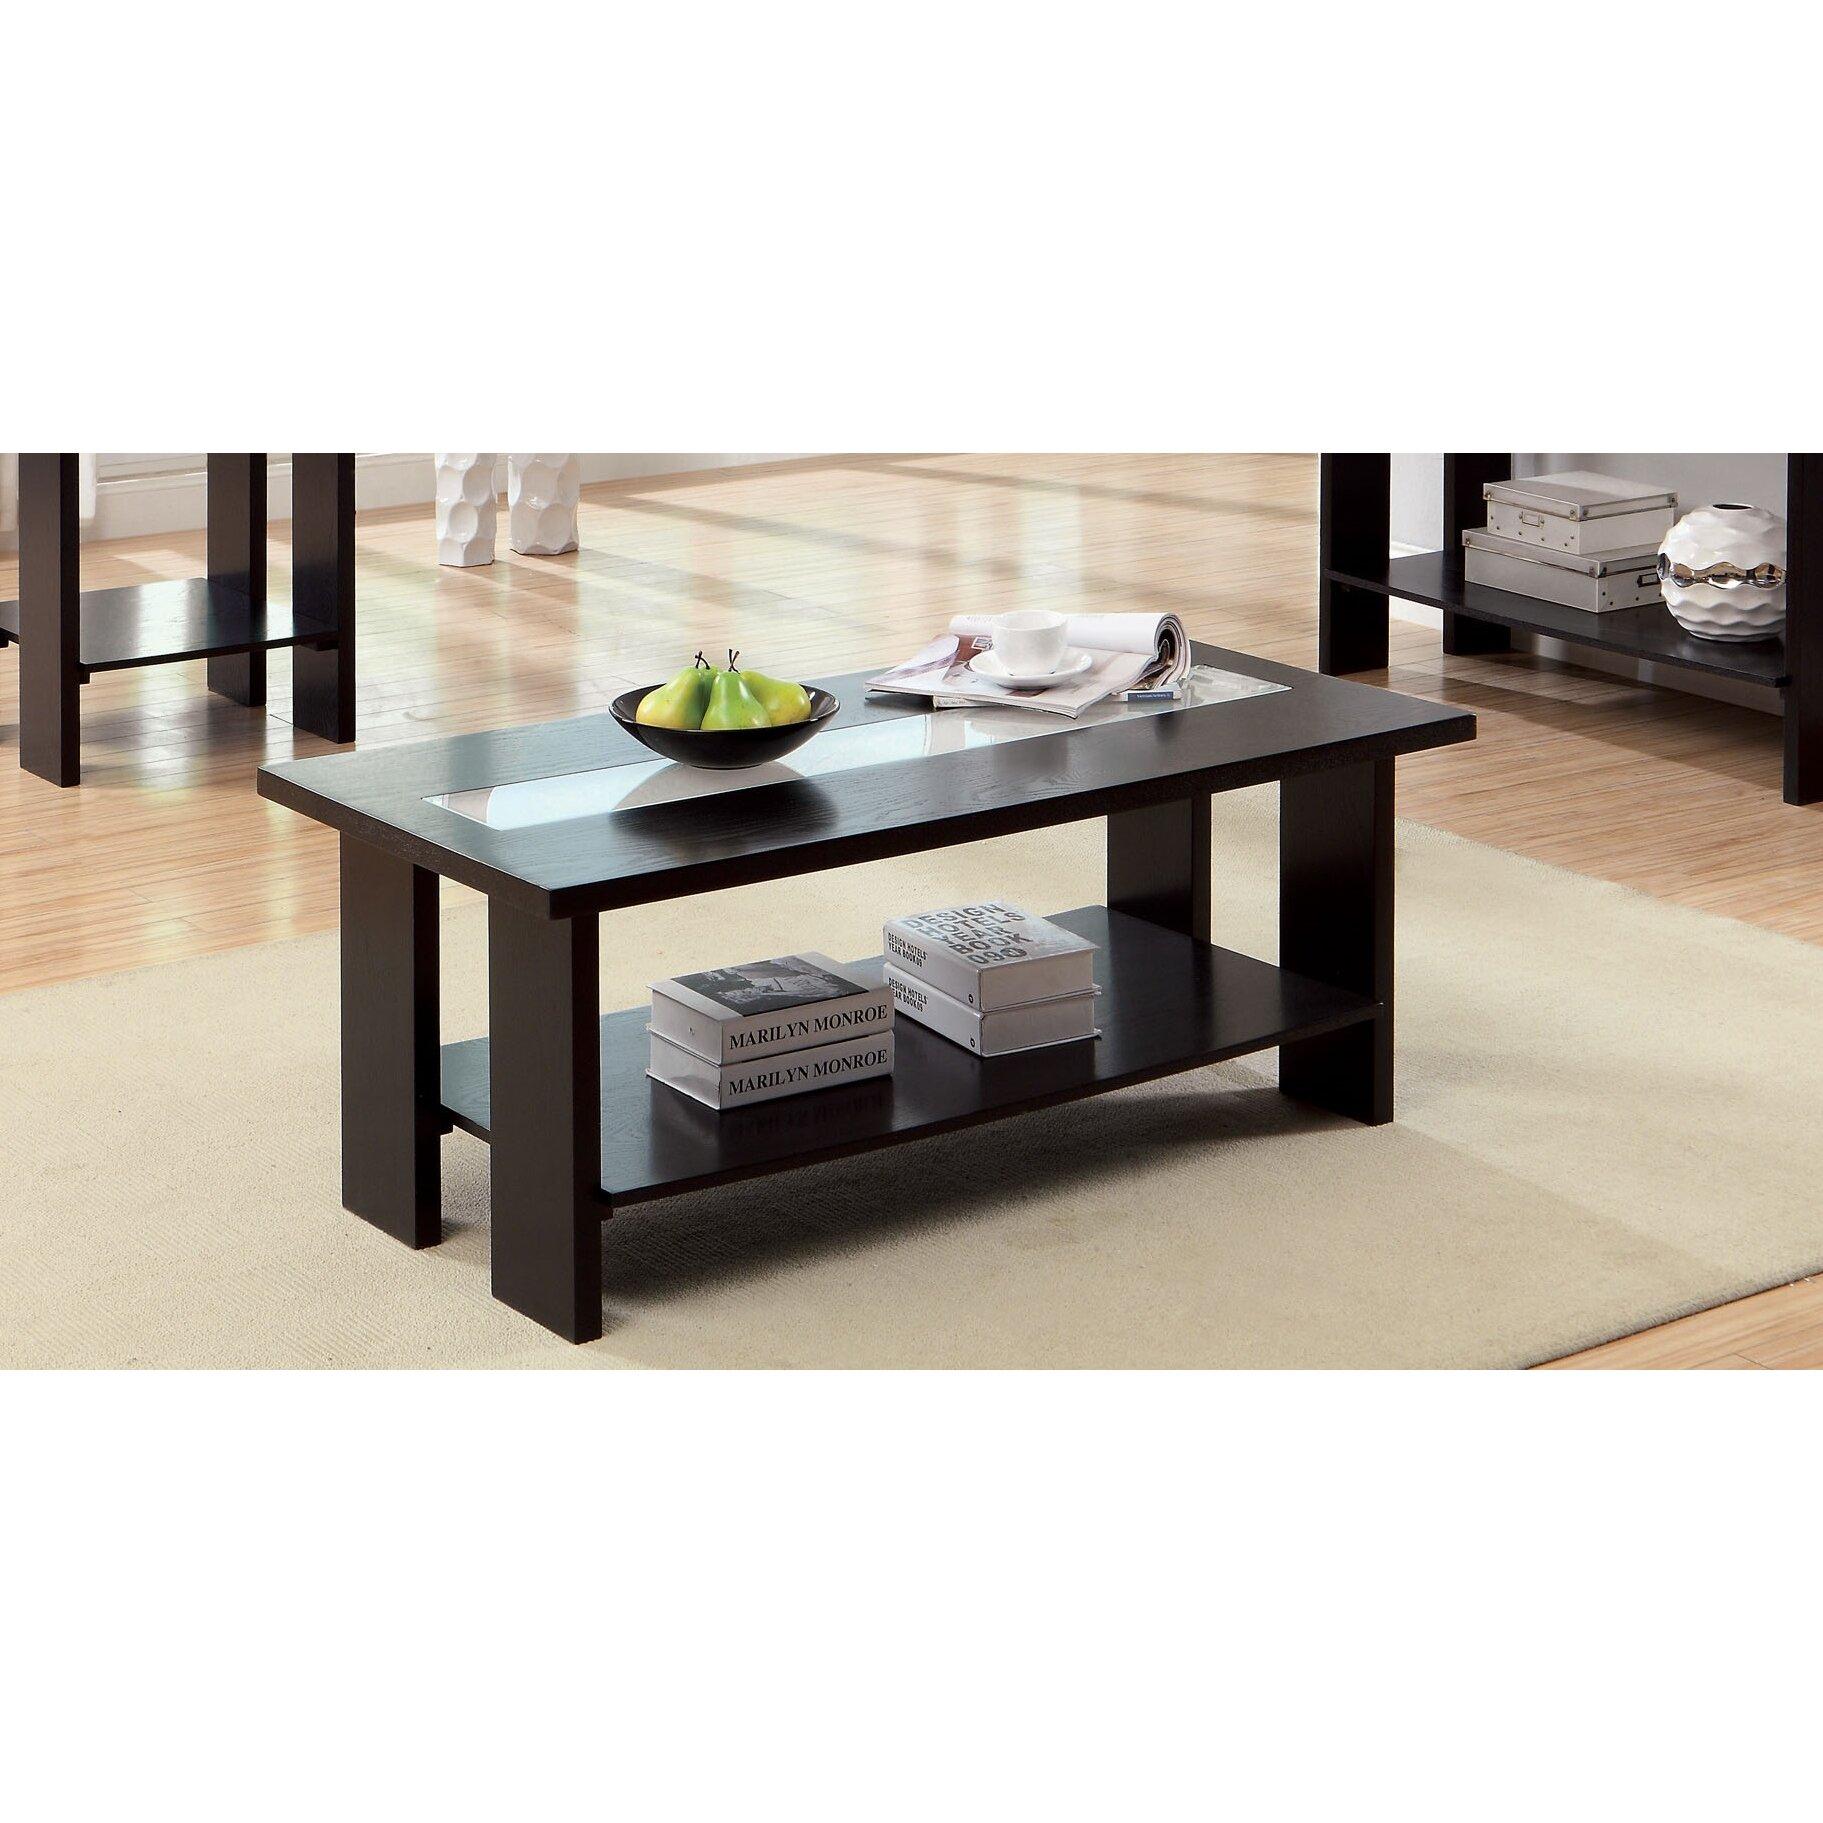 hokku designs liluxe coffee table reviews wayfair. Black Bedroom Furniture Sets. Home Design Ideas